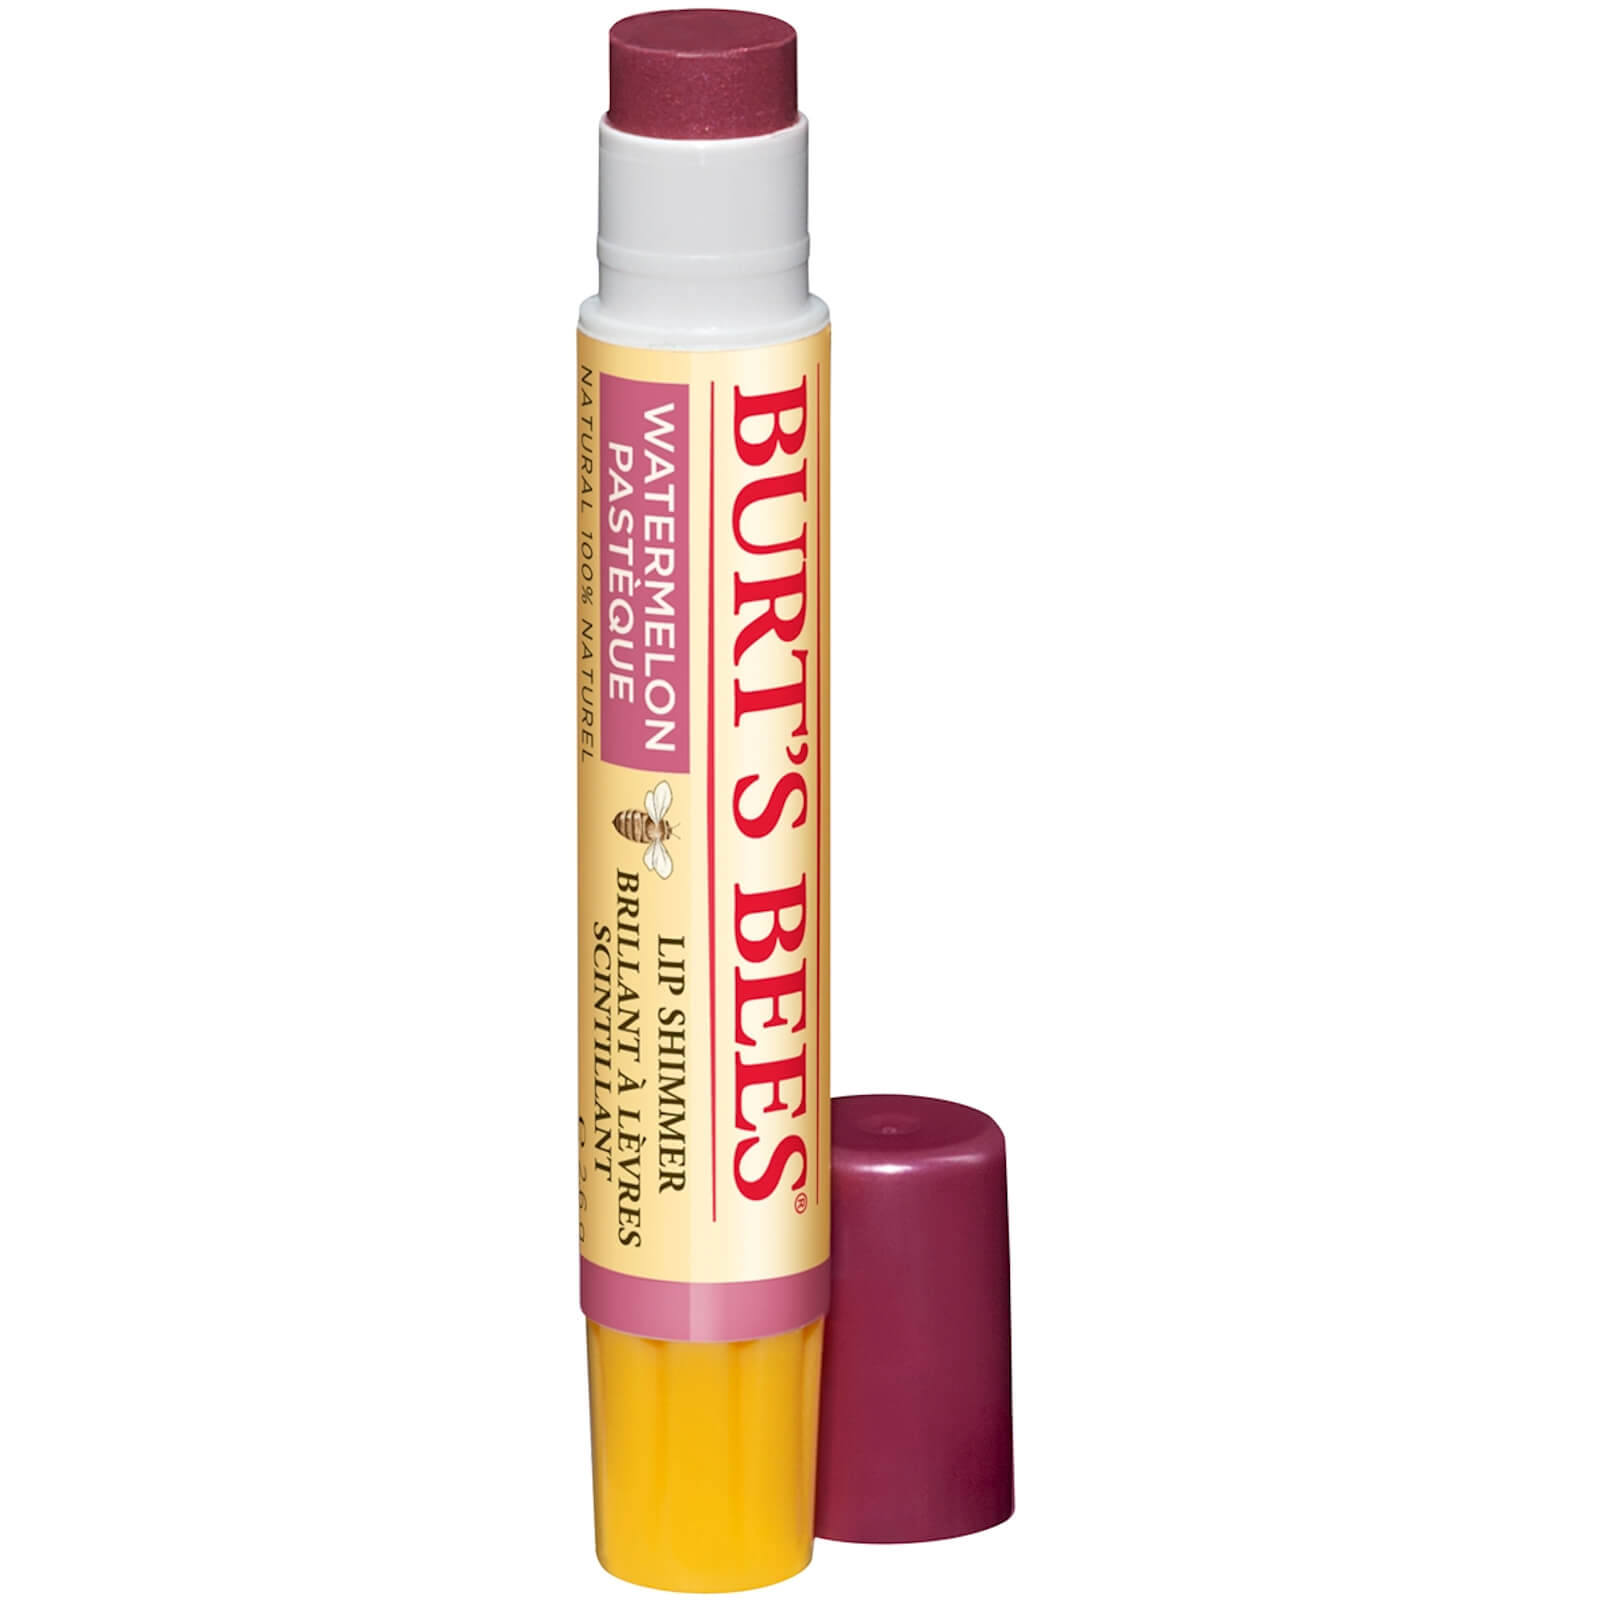 Burt's Bees Lip Shimmer 2.6g (Various Shades) - Watermelon